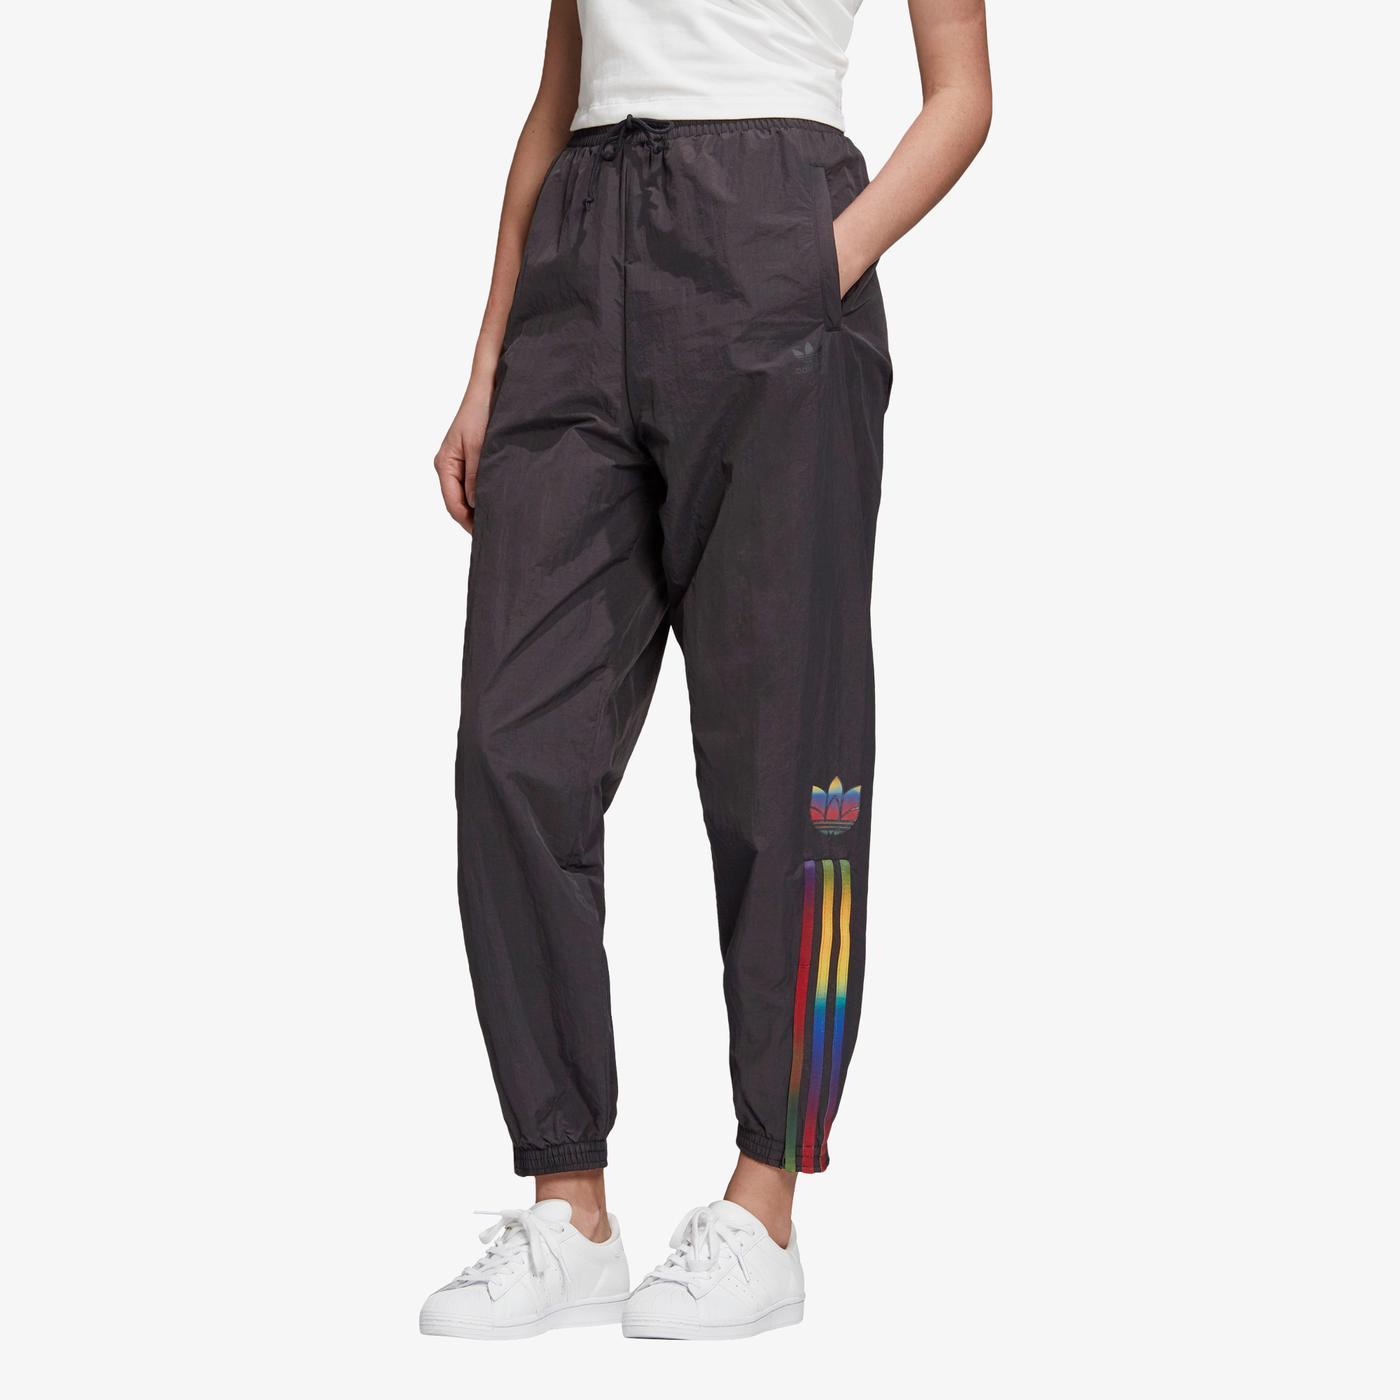 adidas Adicolor Kadın Siyah Eşofman Altı